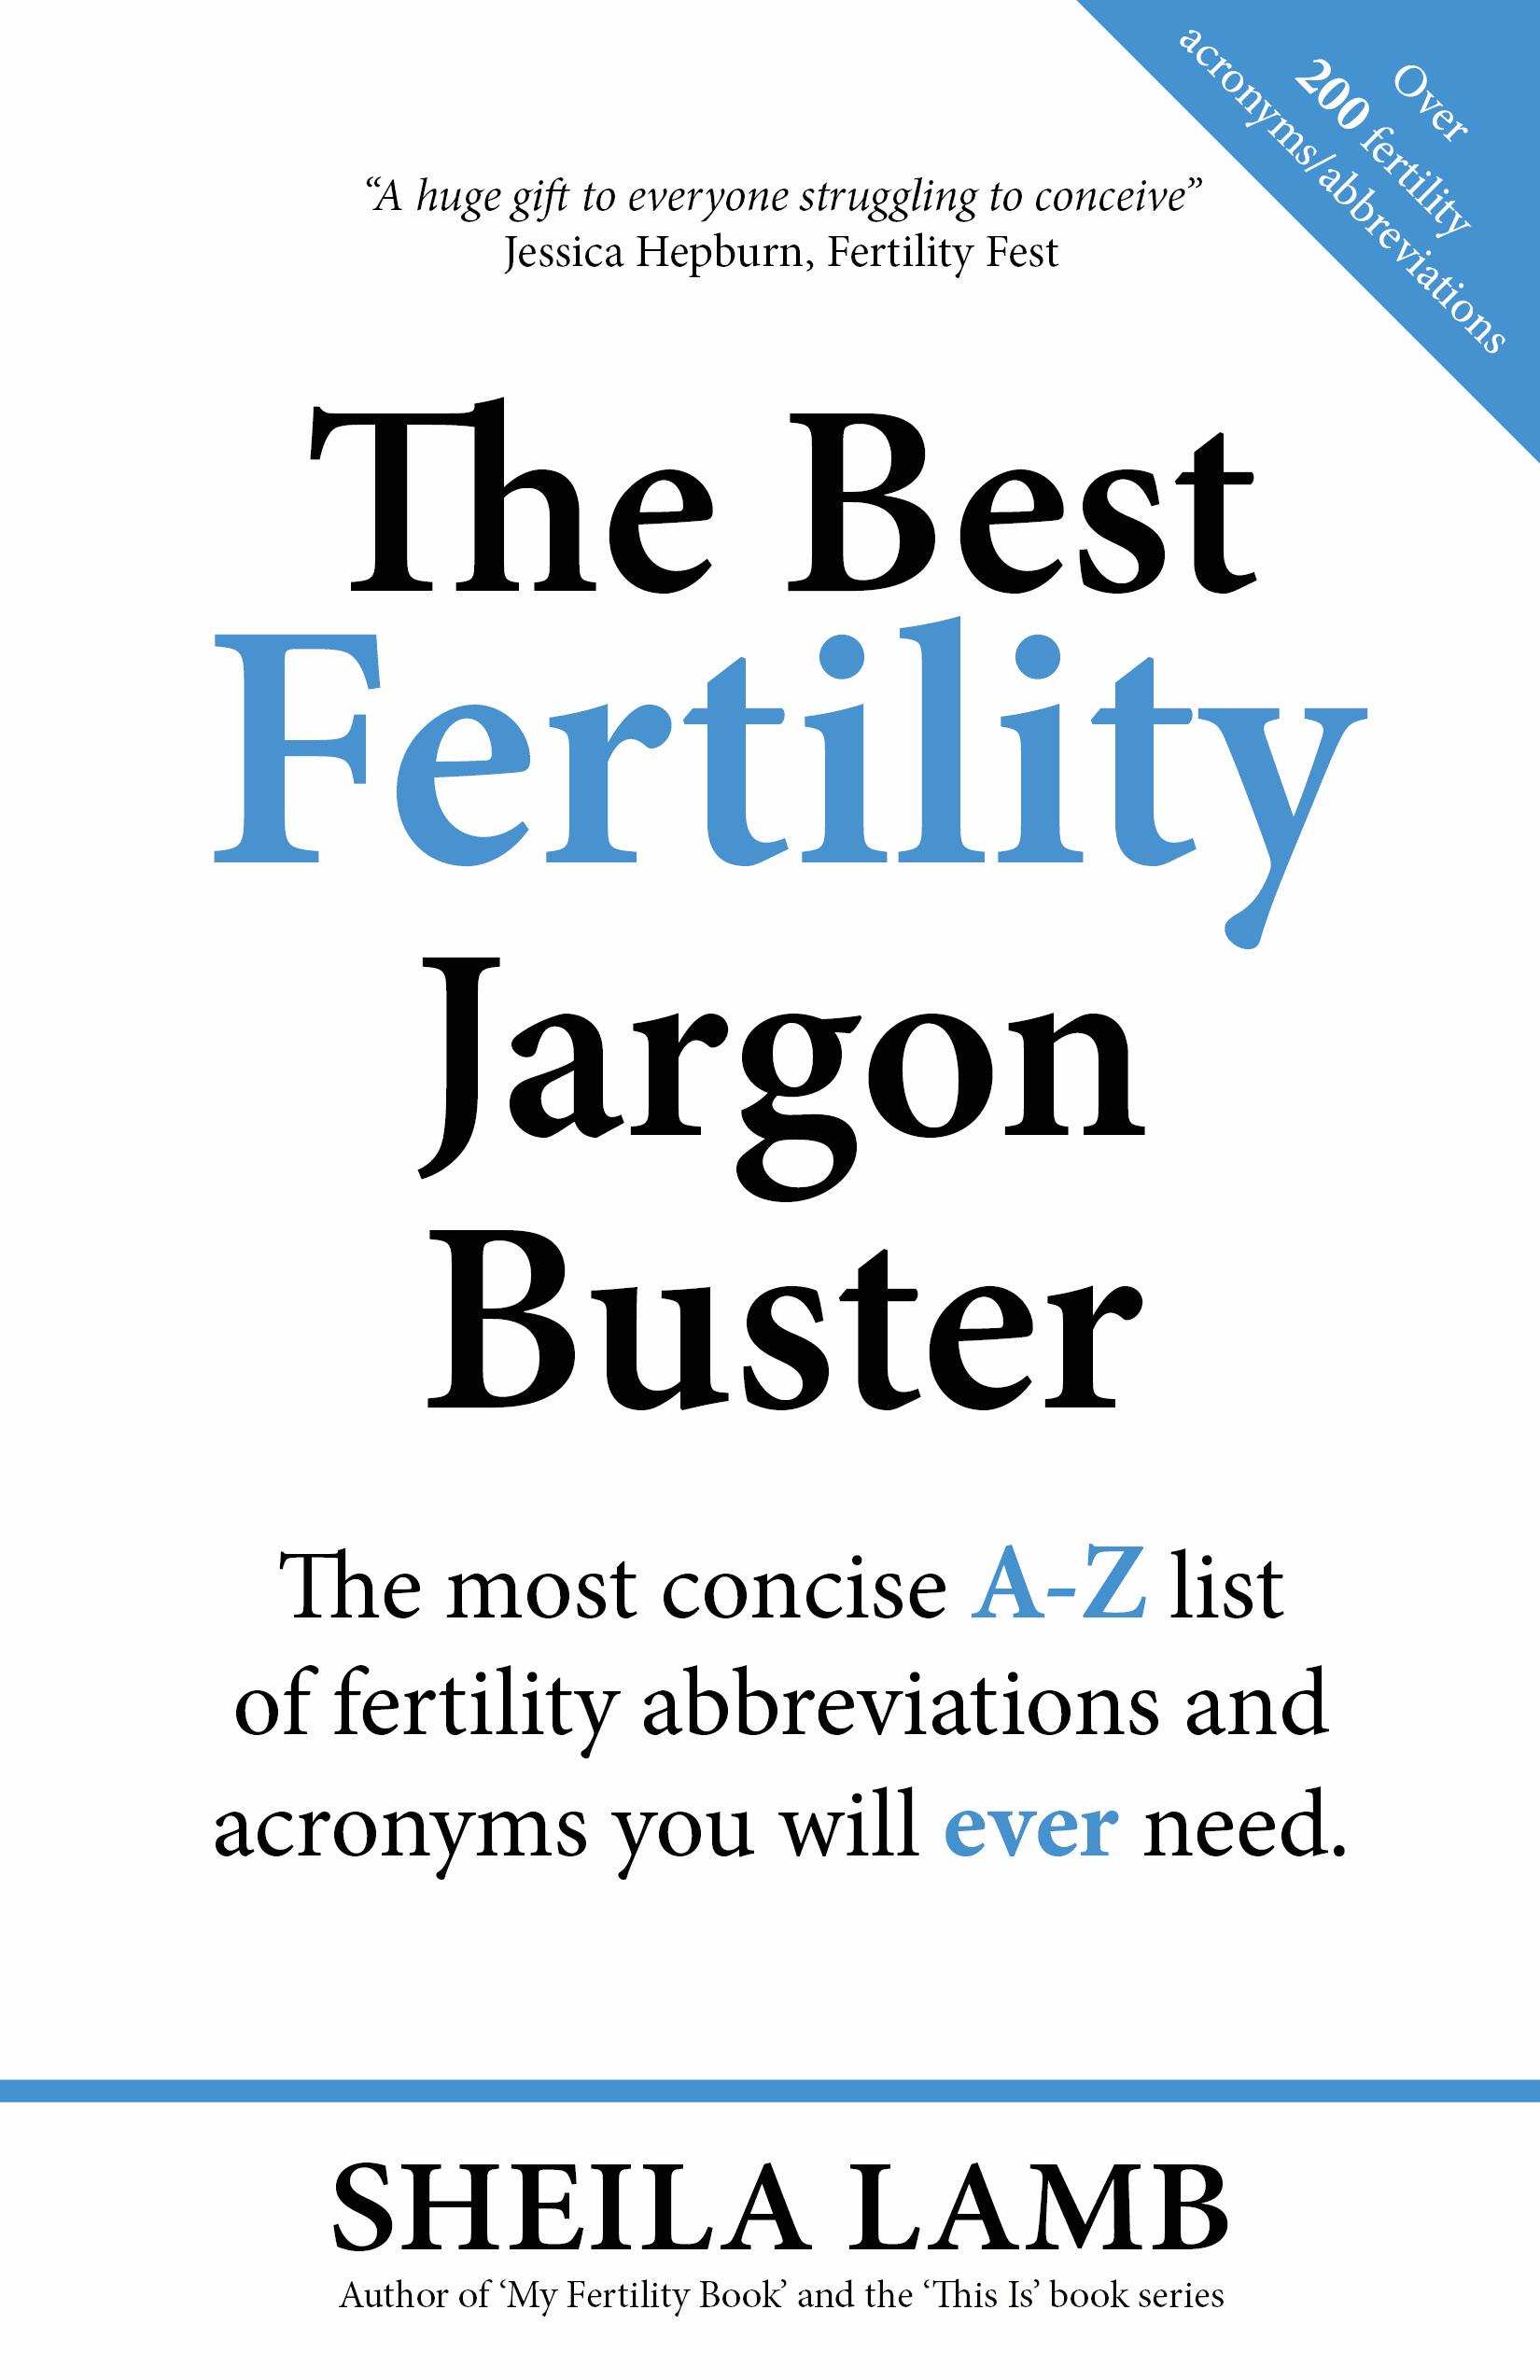 The Best Fertility Jargon Book